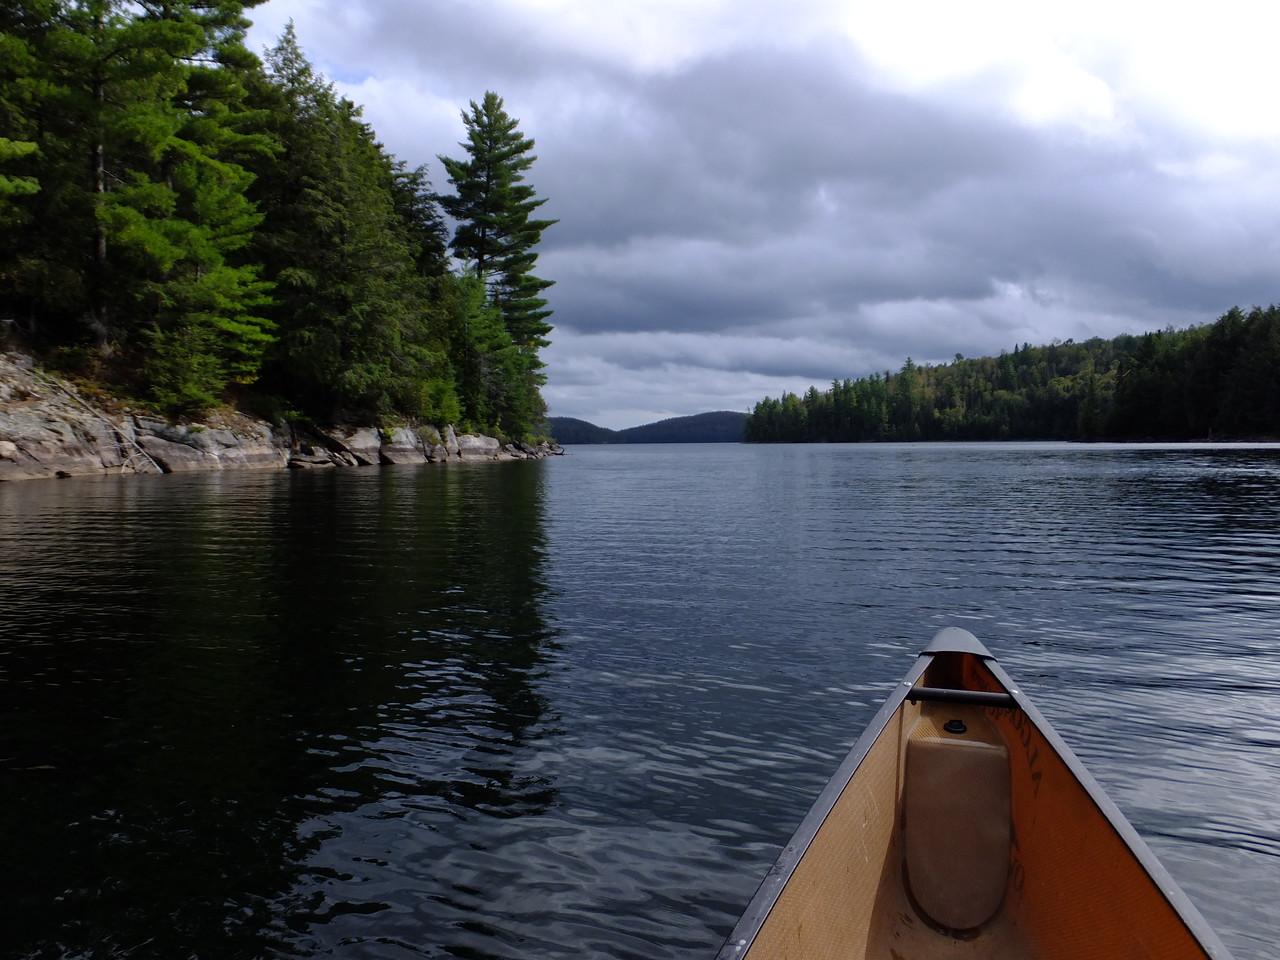 Approaching the main part of Louisa.  It's a big beautiful lake.